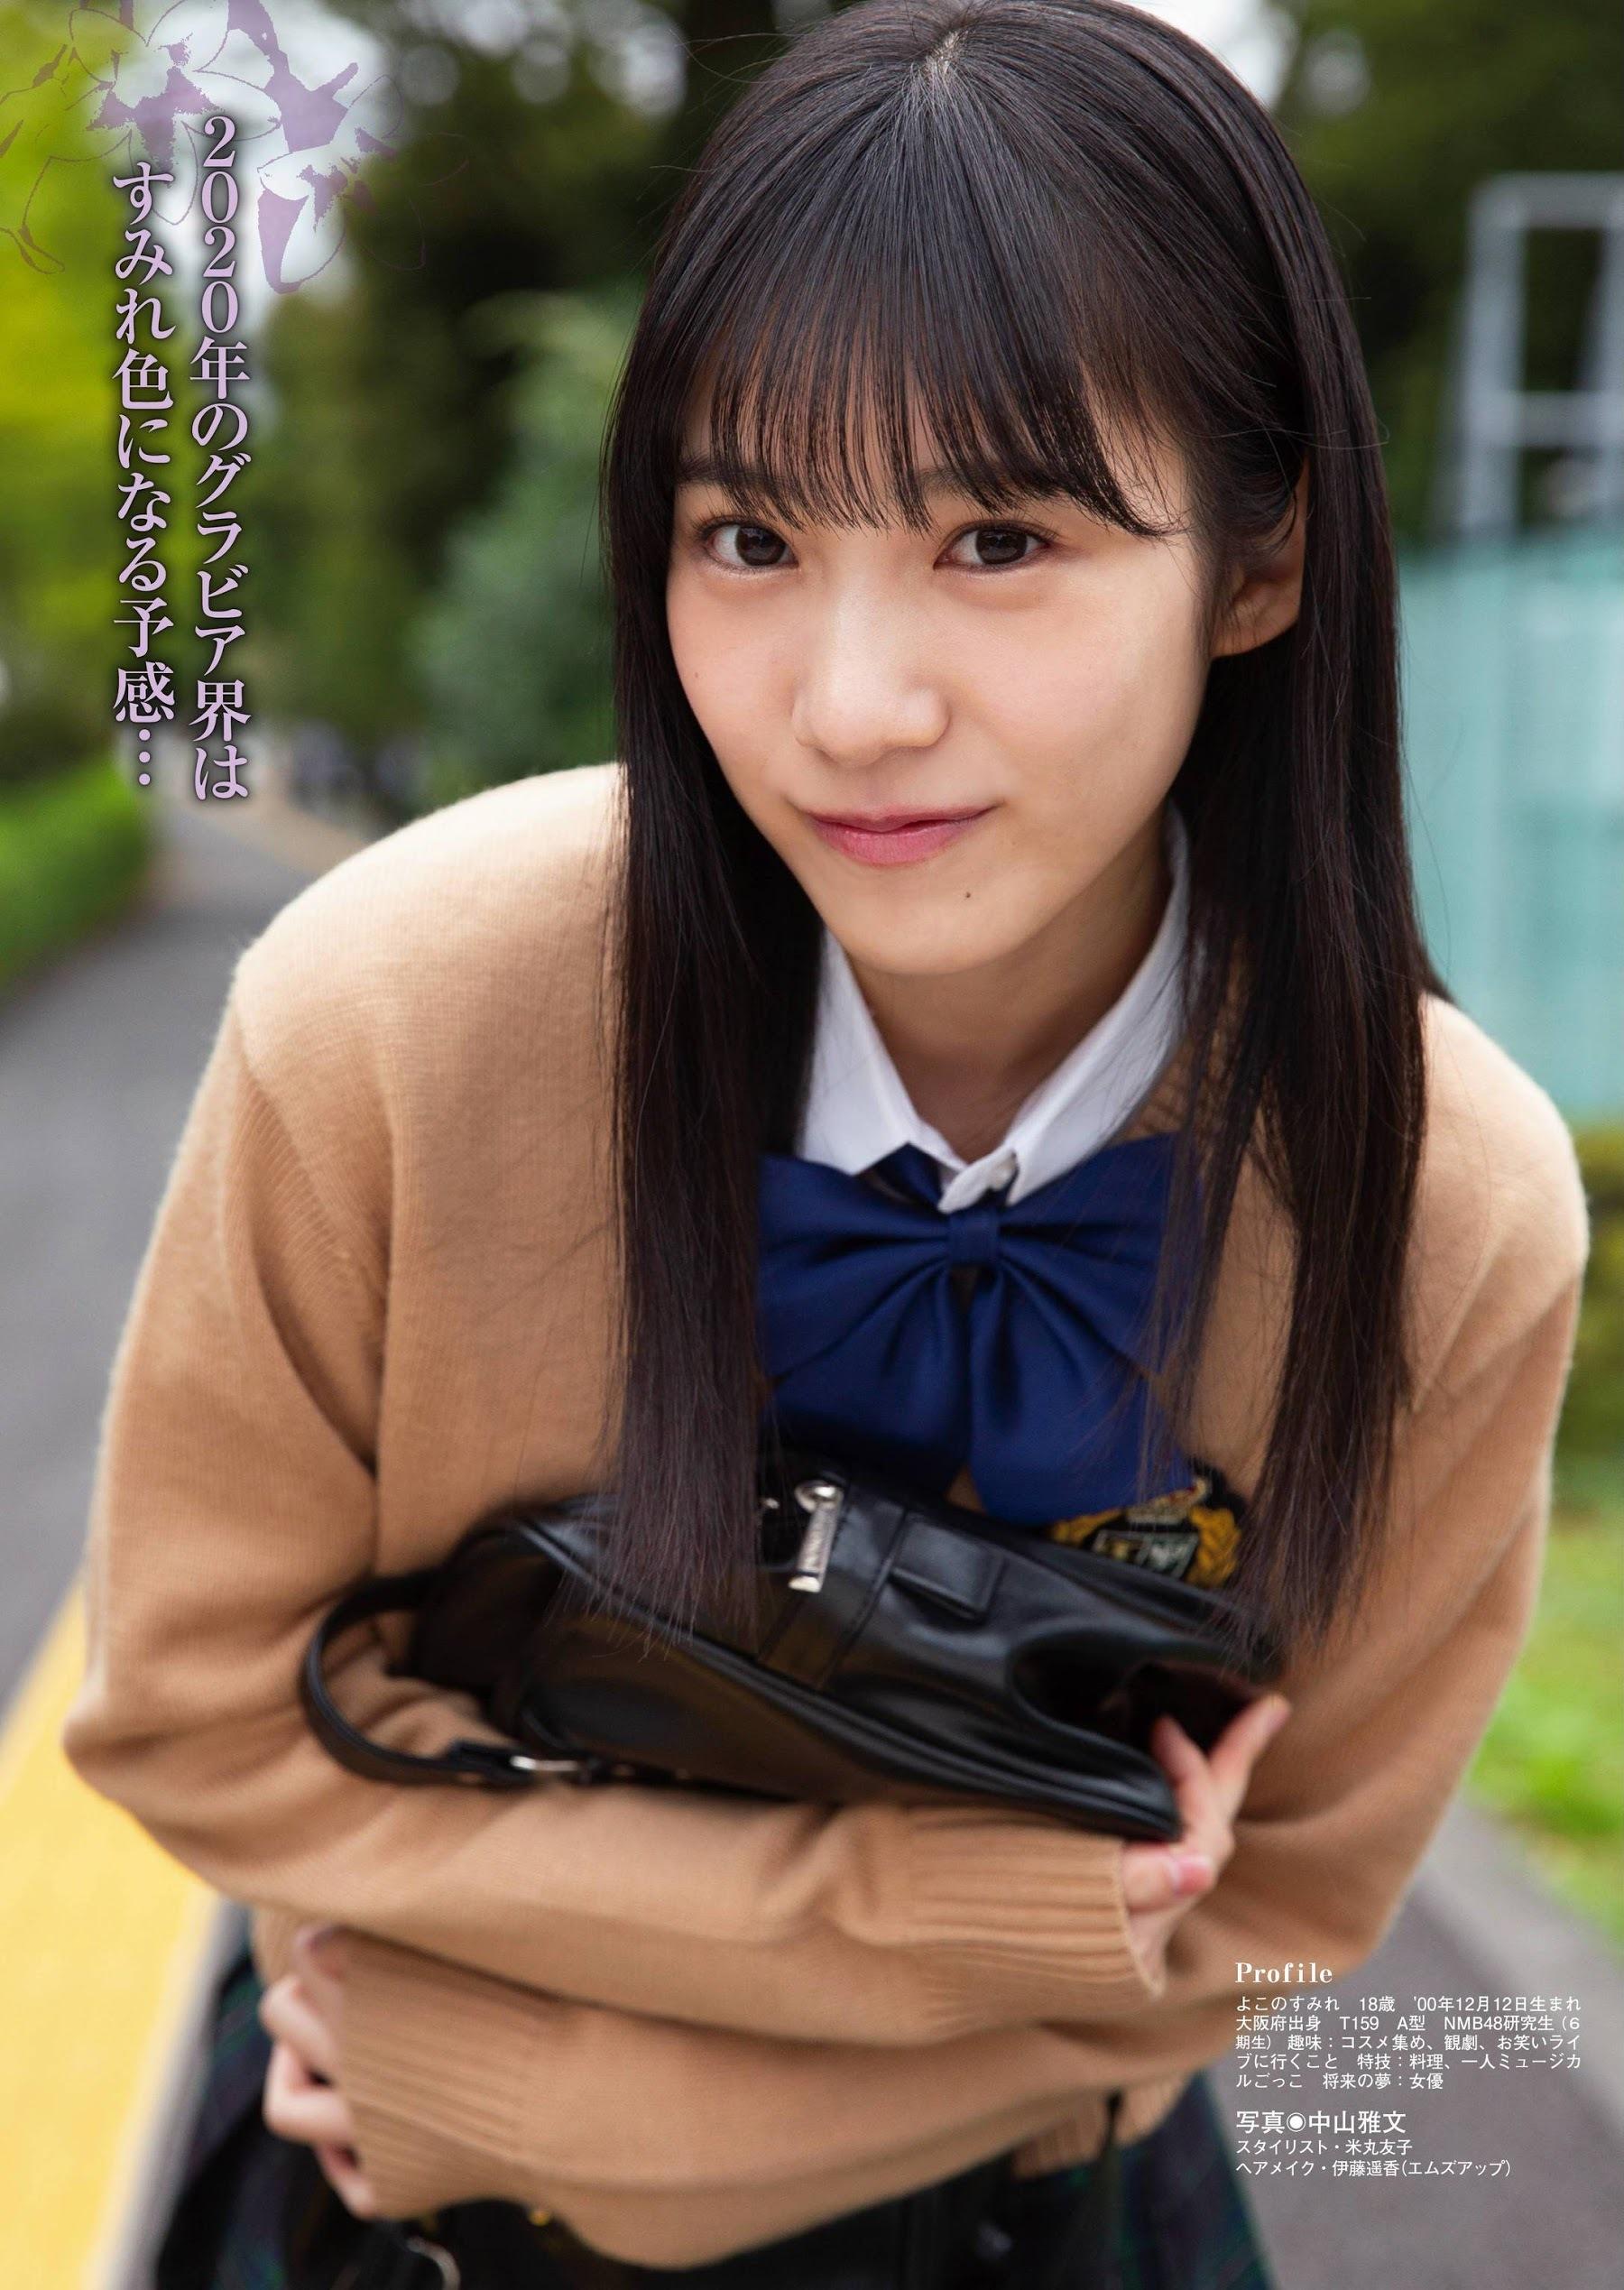 NMB48 Rising Star of Gravure Sumire Yokono 2019007